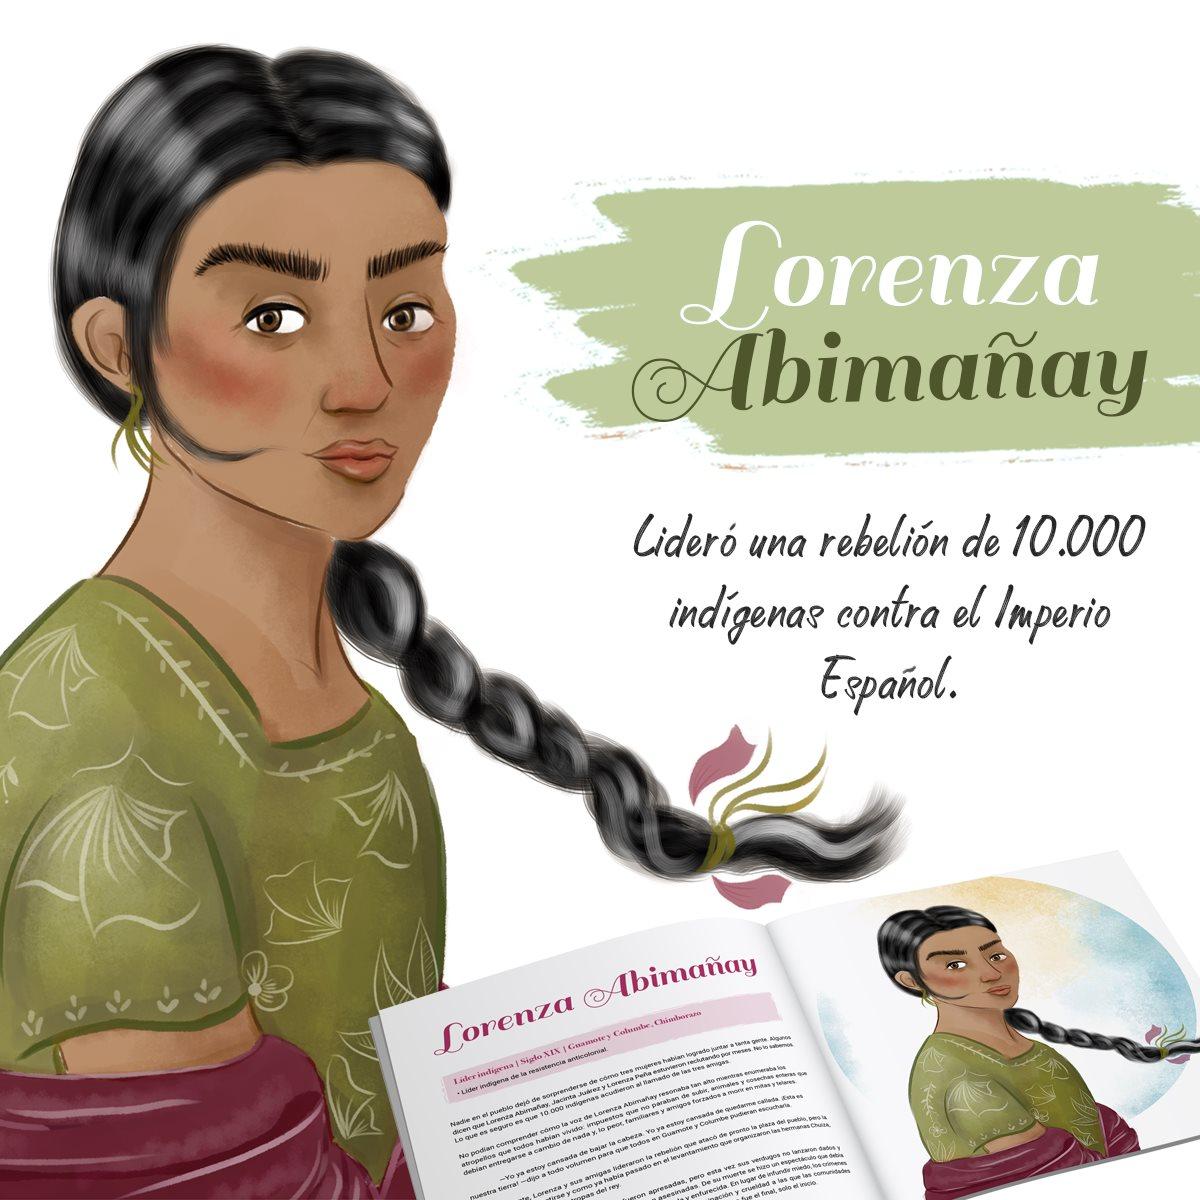 Lorenza Abimañay  ©KynkuMarketingSocial